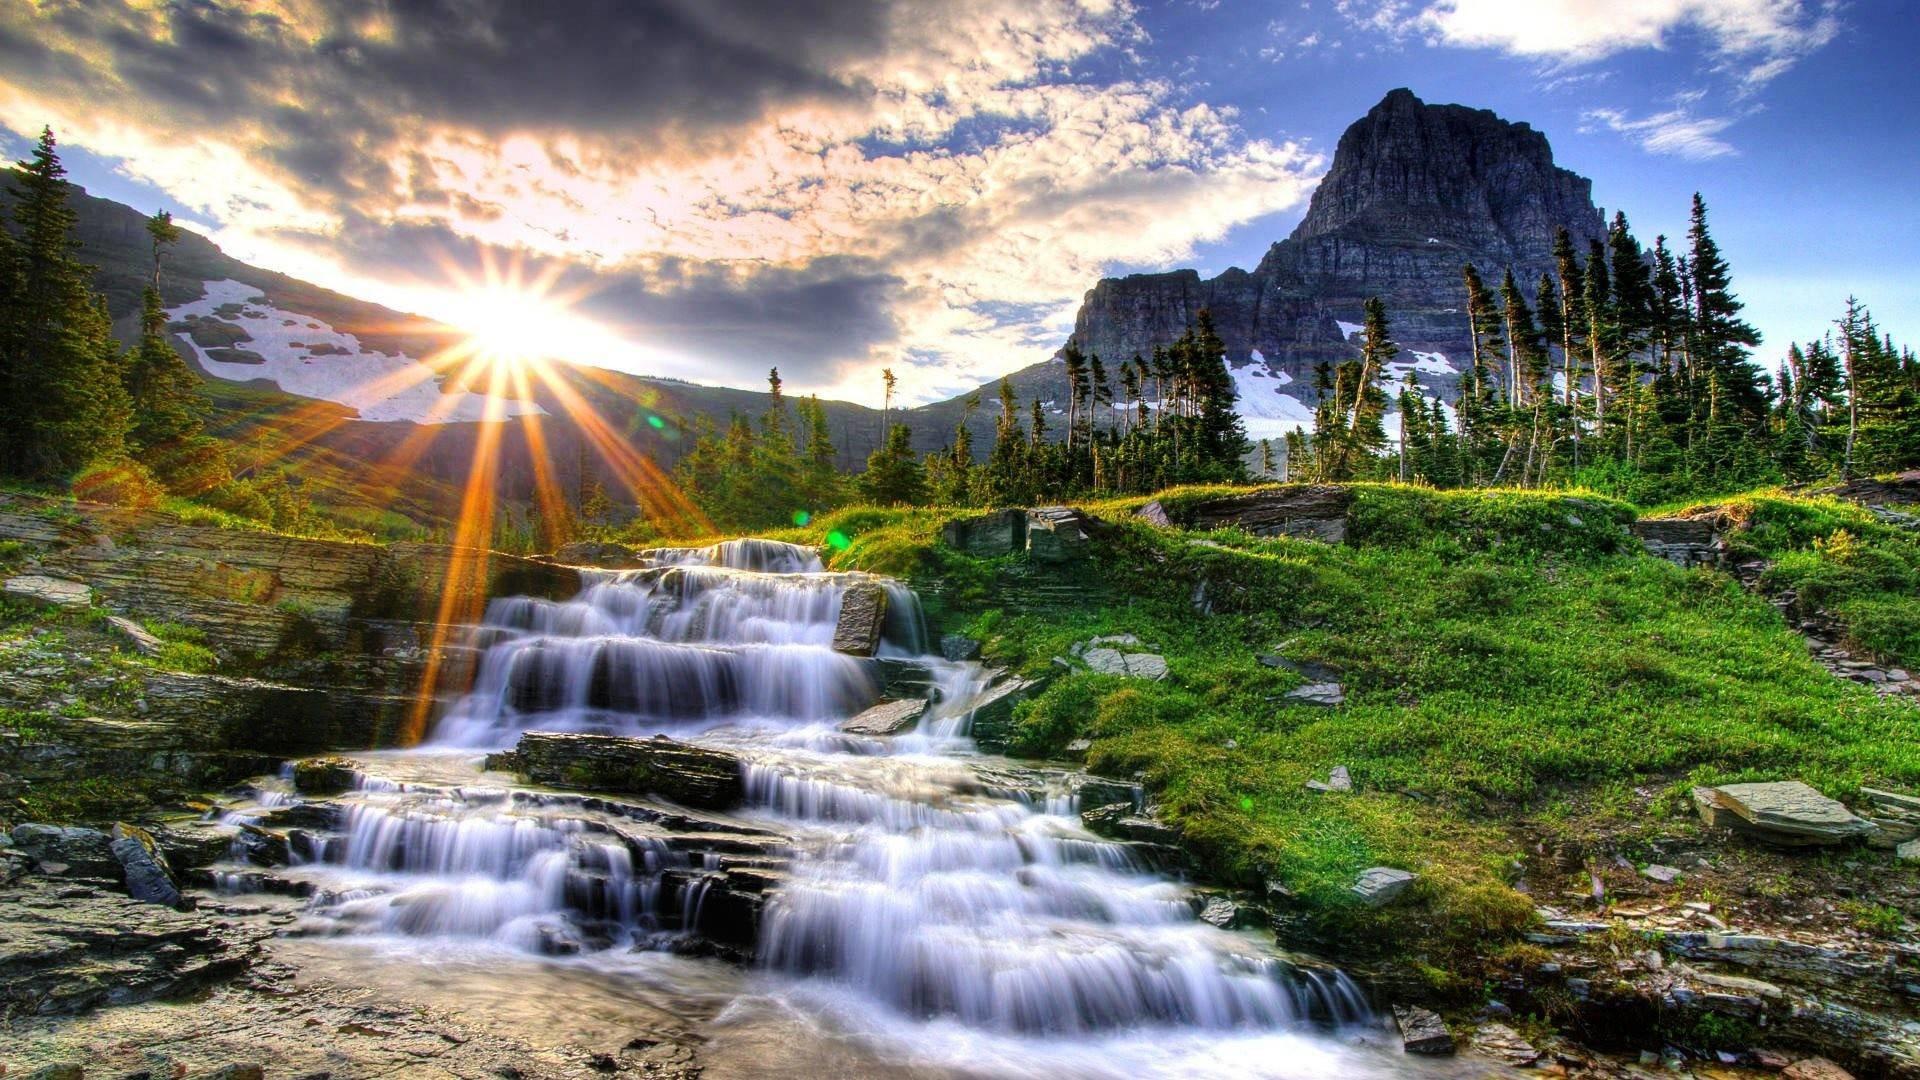 Nature Backgrounds Desktop 61 Pictures